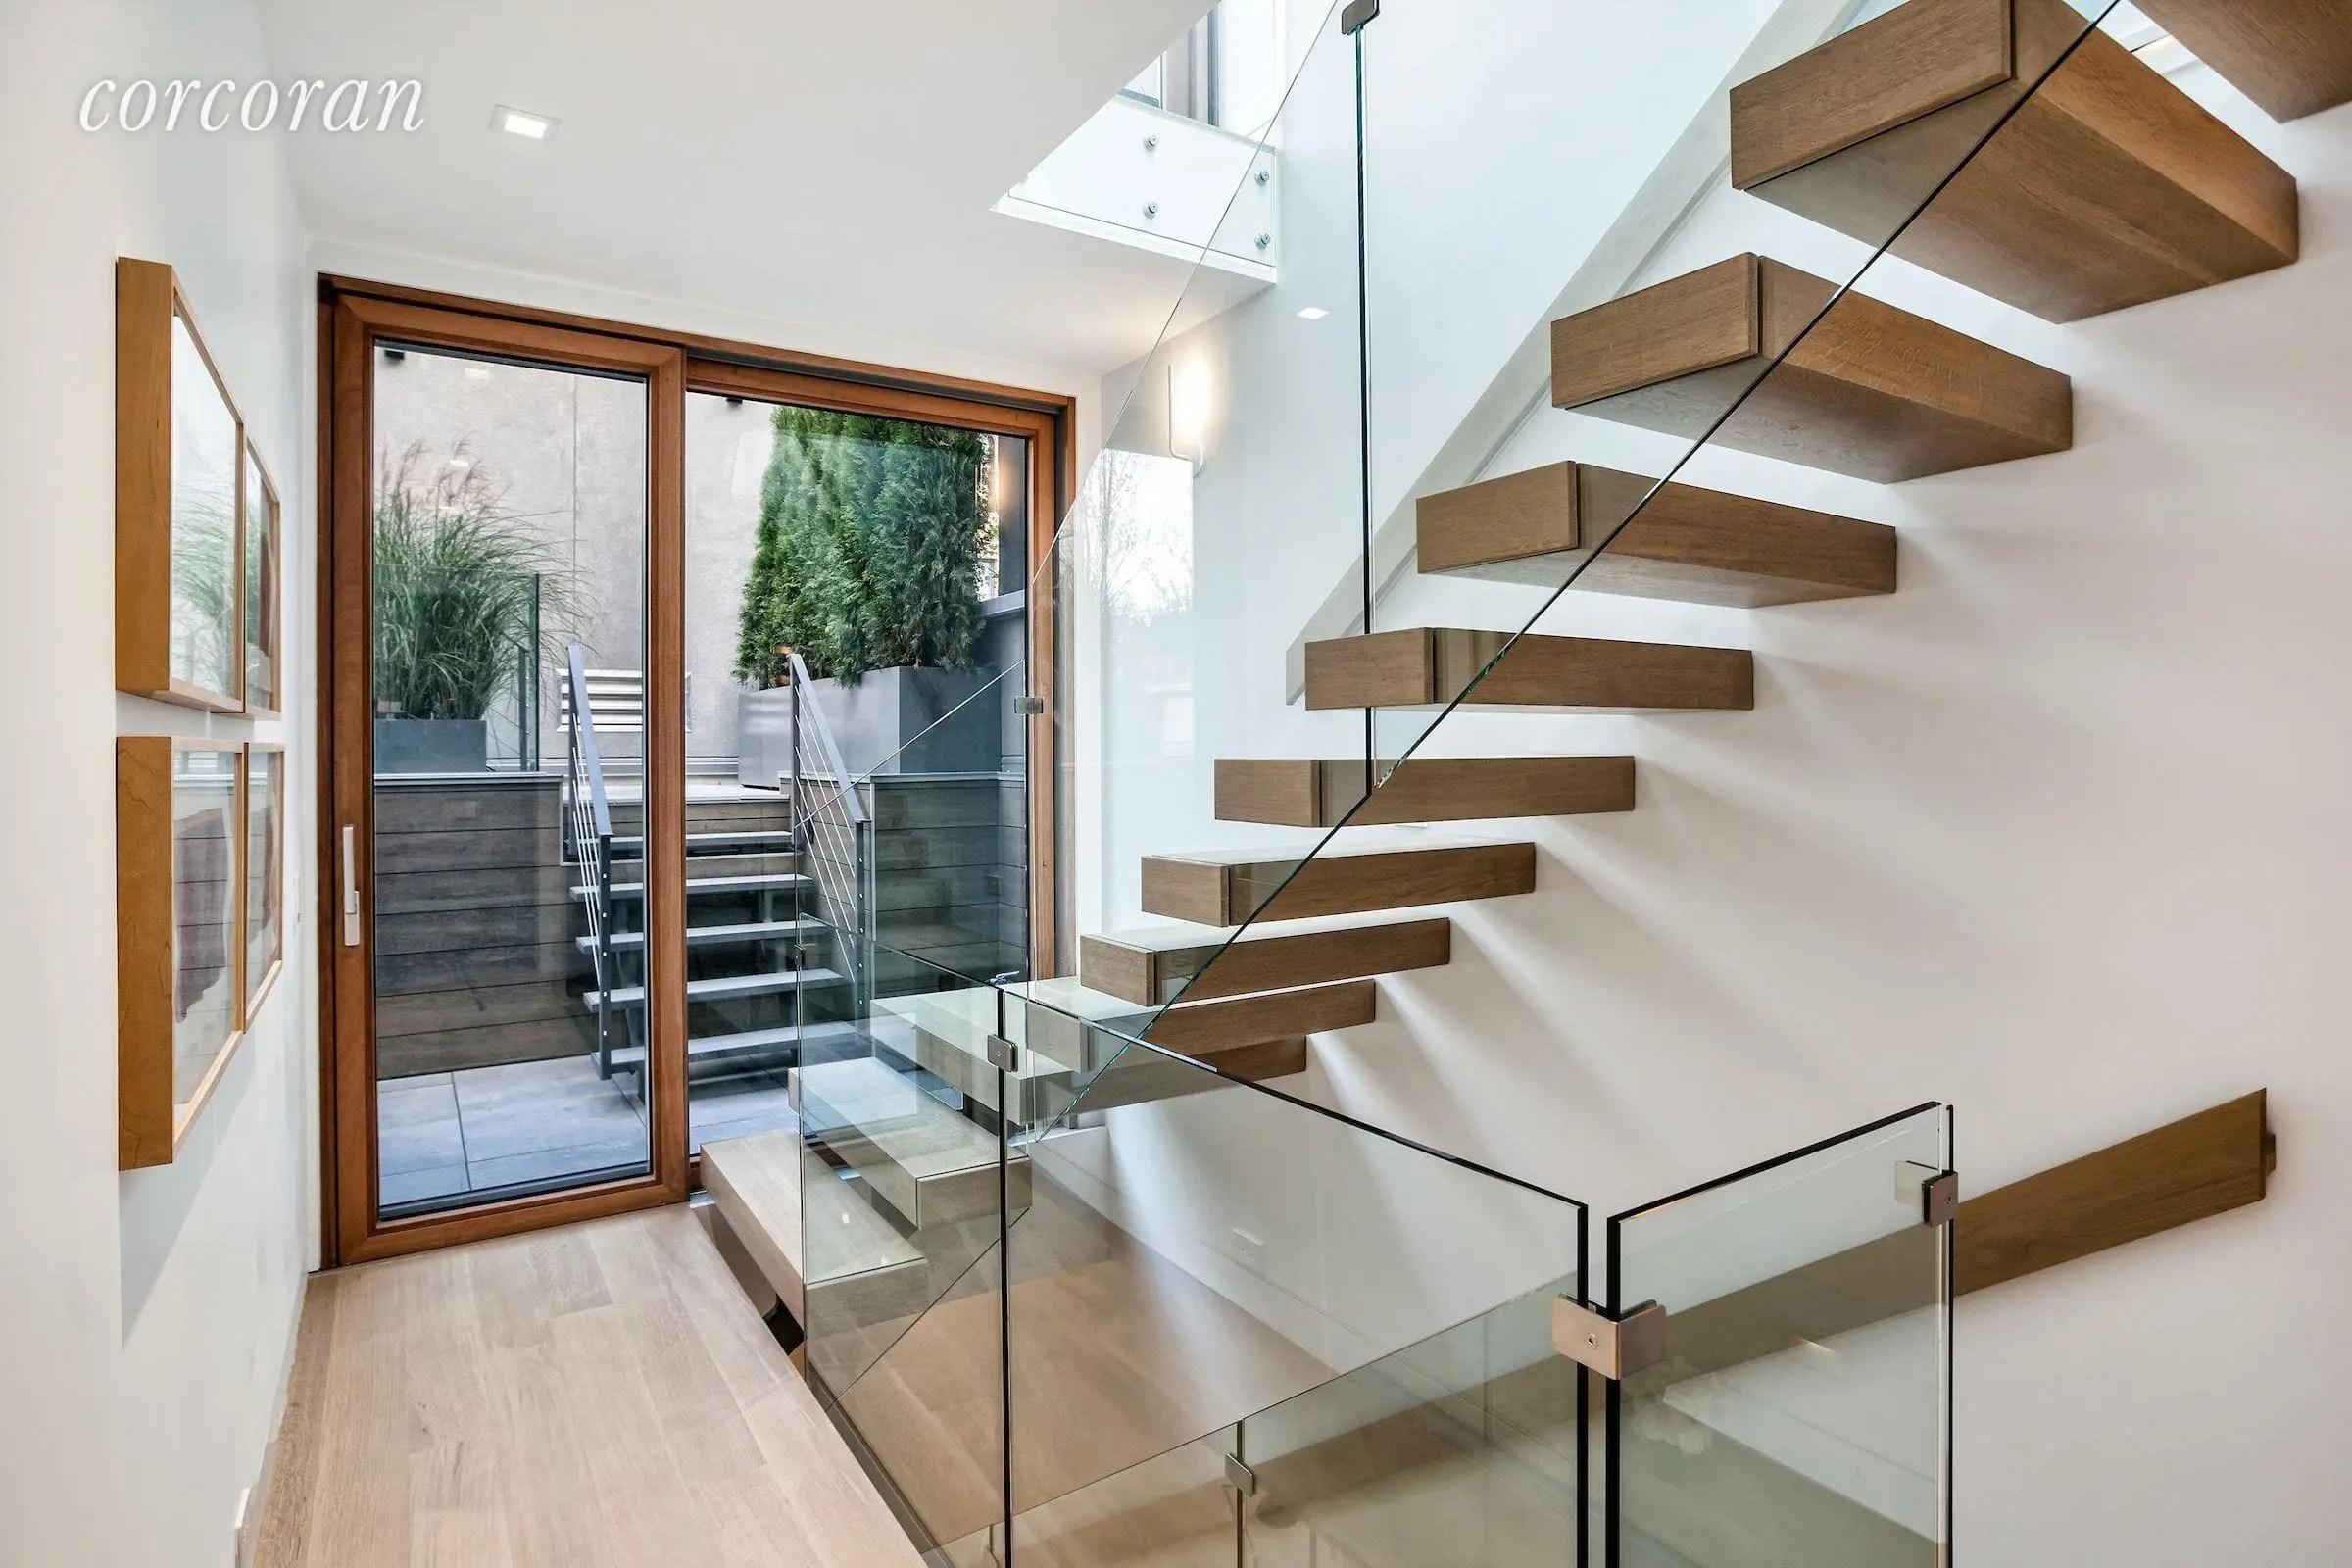 Handrails & Glass Balustrades